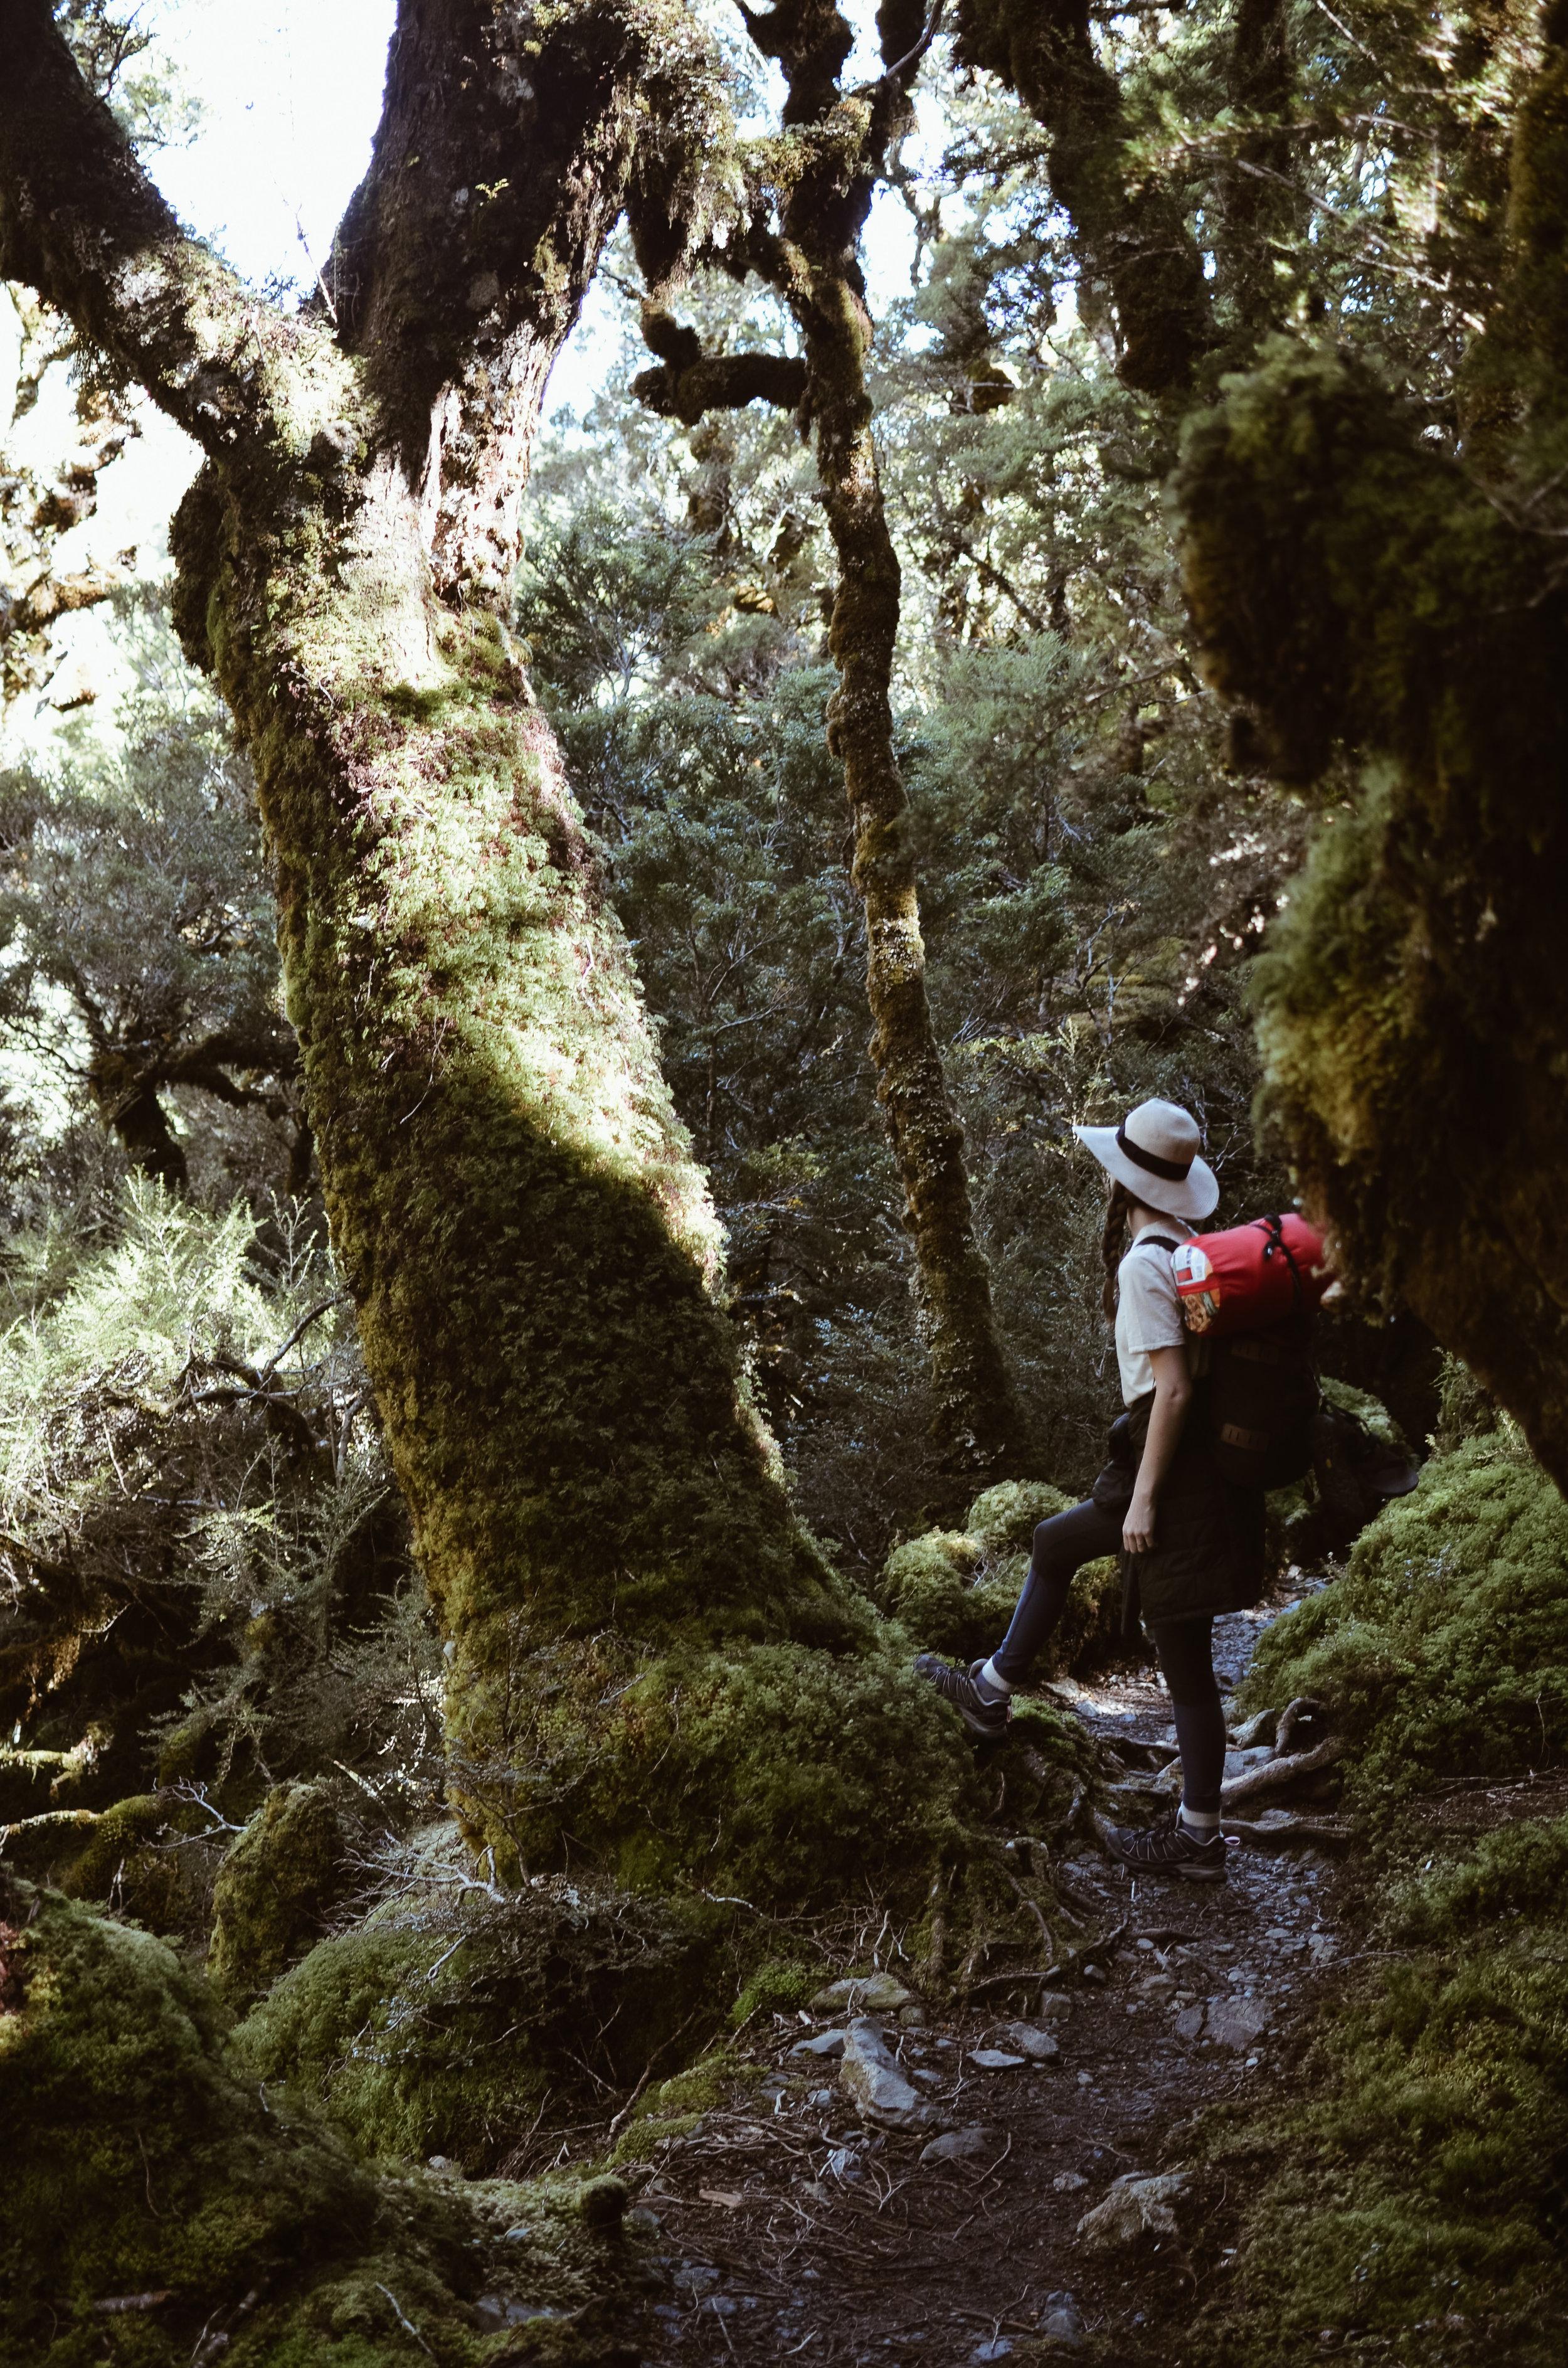 routeburn+track+new+zealand+kate+parrish+life+on+pine_DSC_0815.jpg